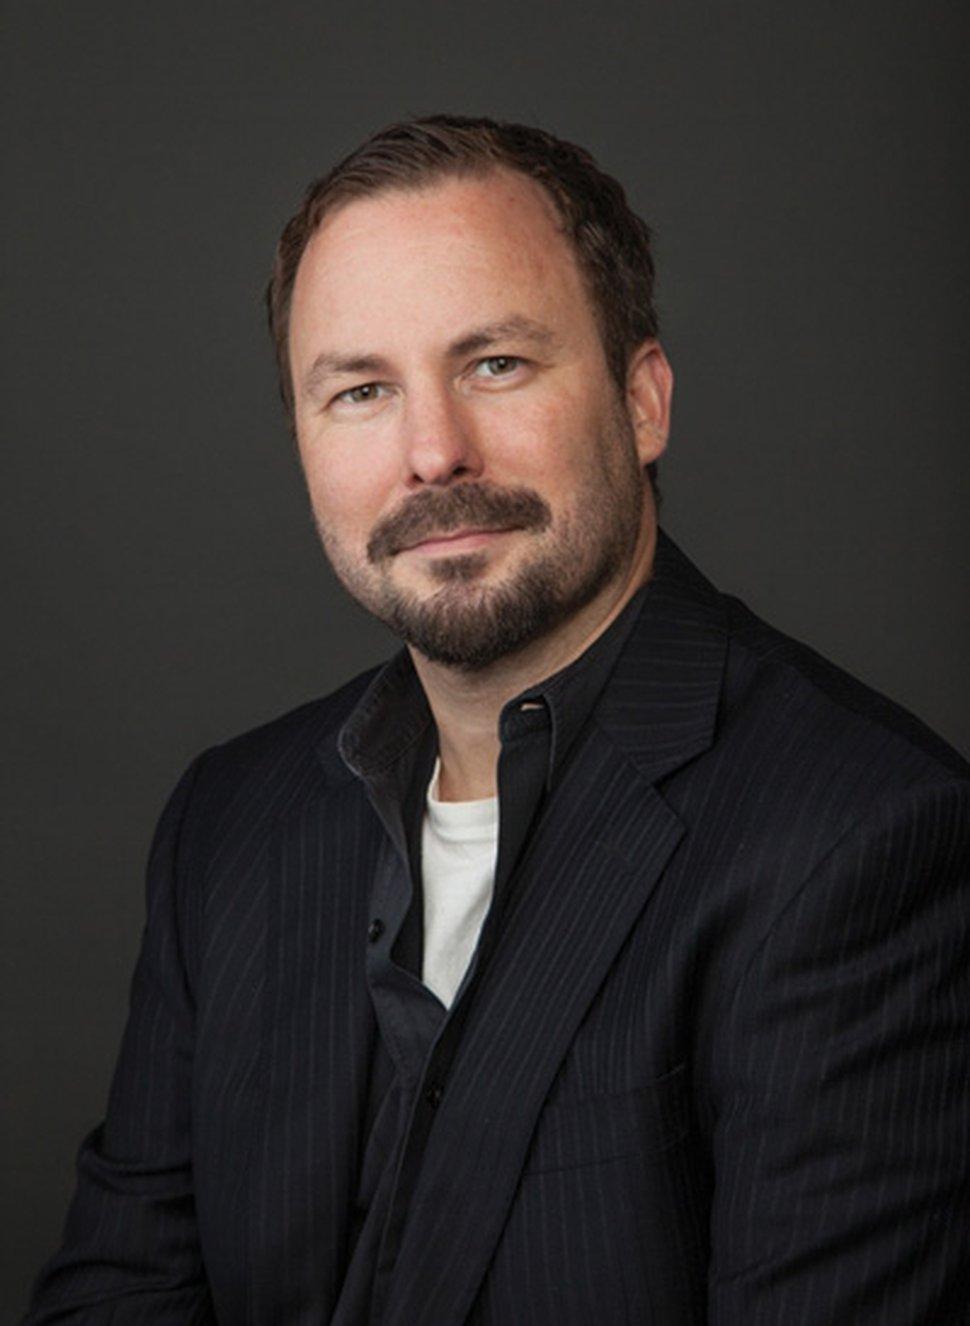 Peter Reichard | The Utah Foundation